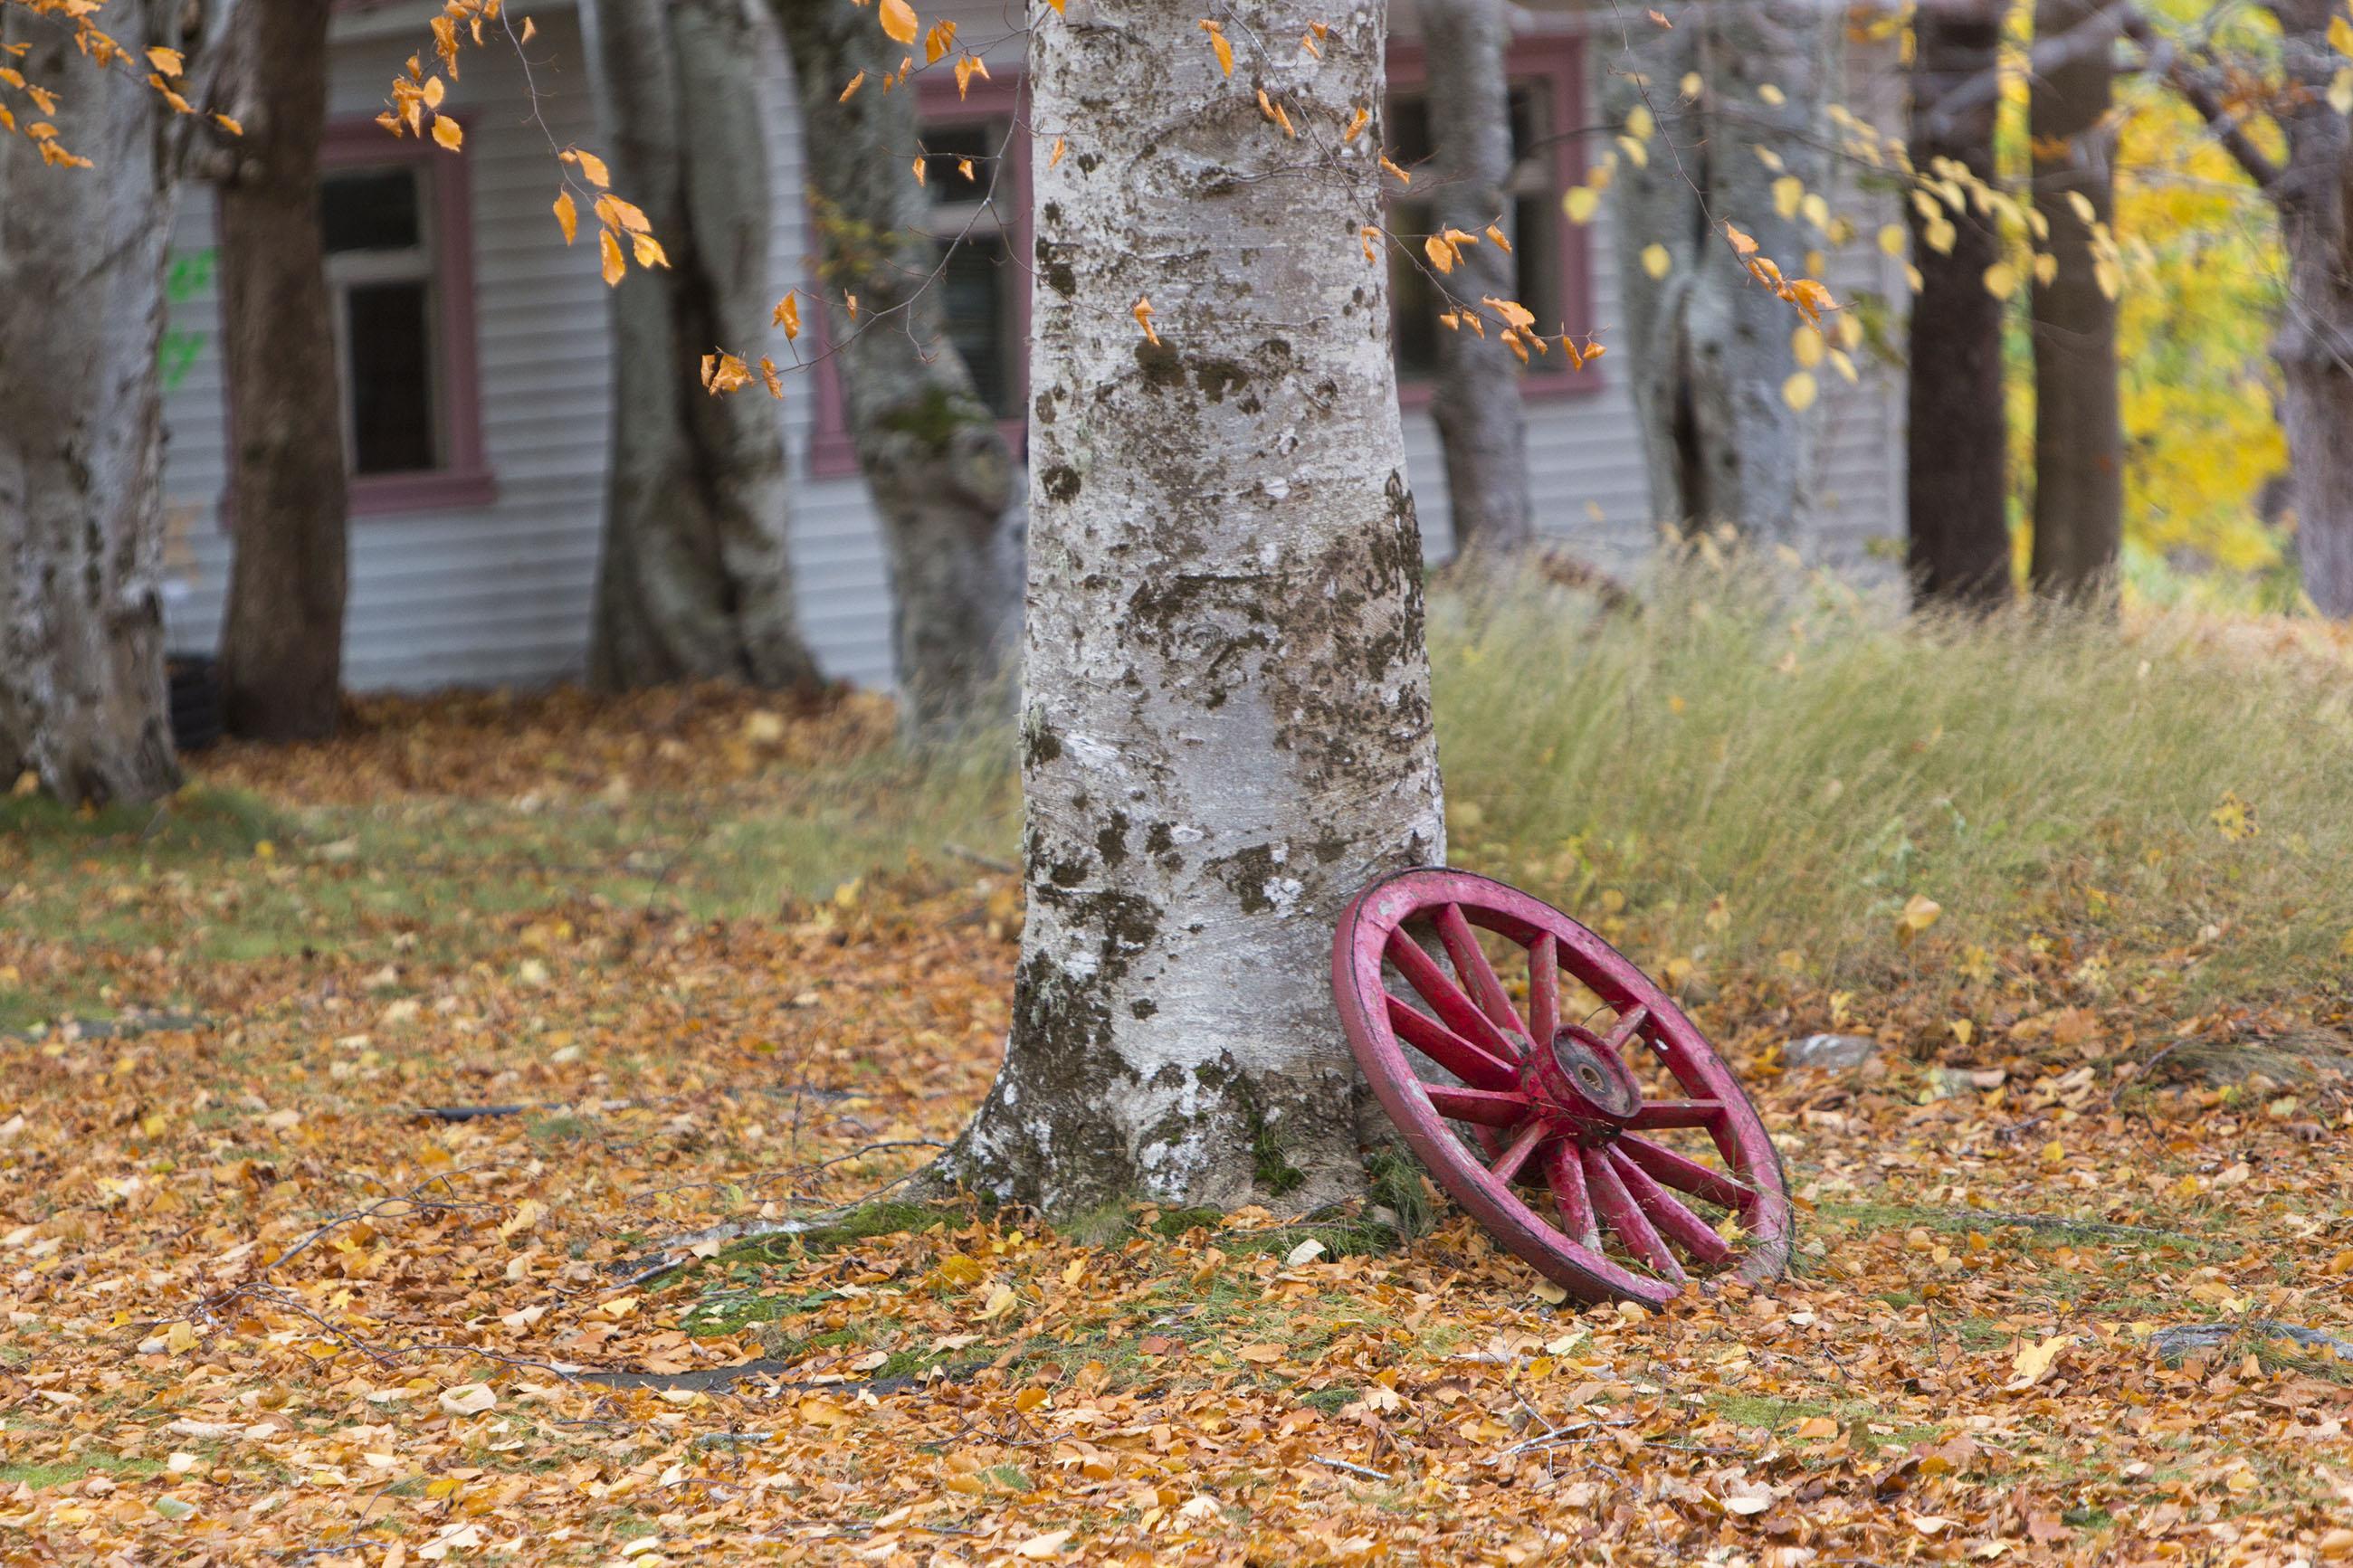 Wagon wheel, Ancient, Rural, Wood, Wheels, HQ Photo